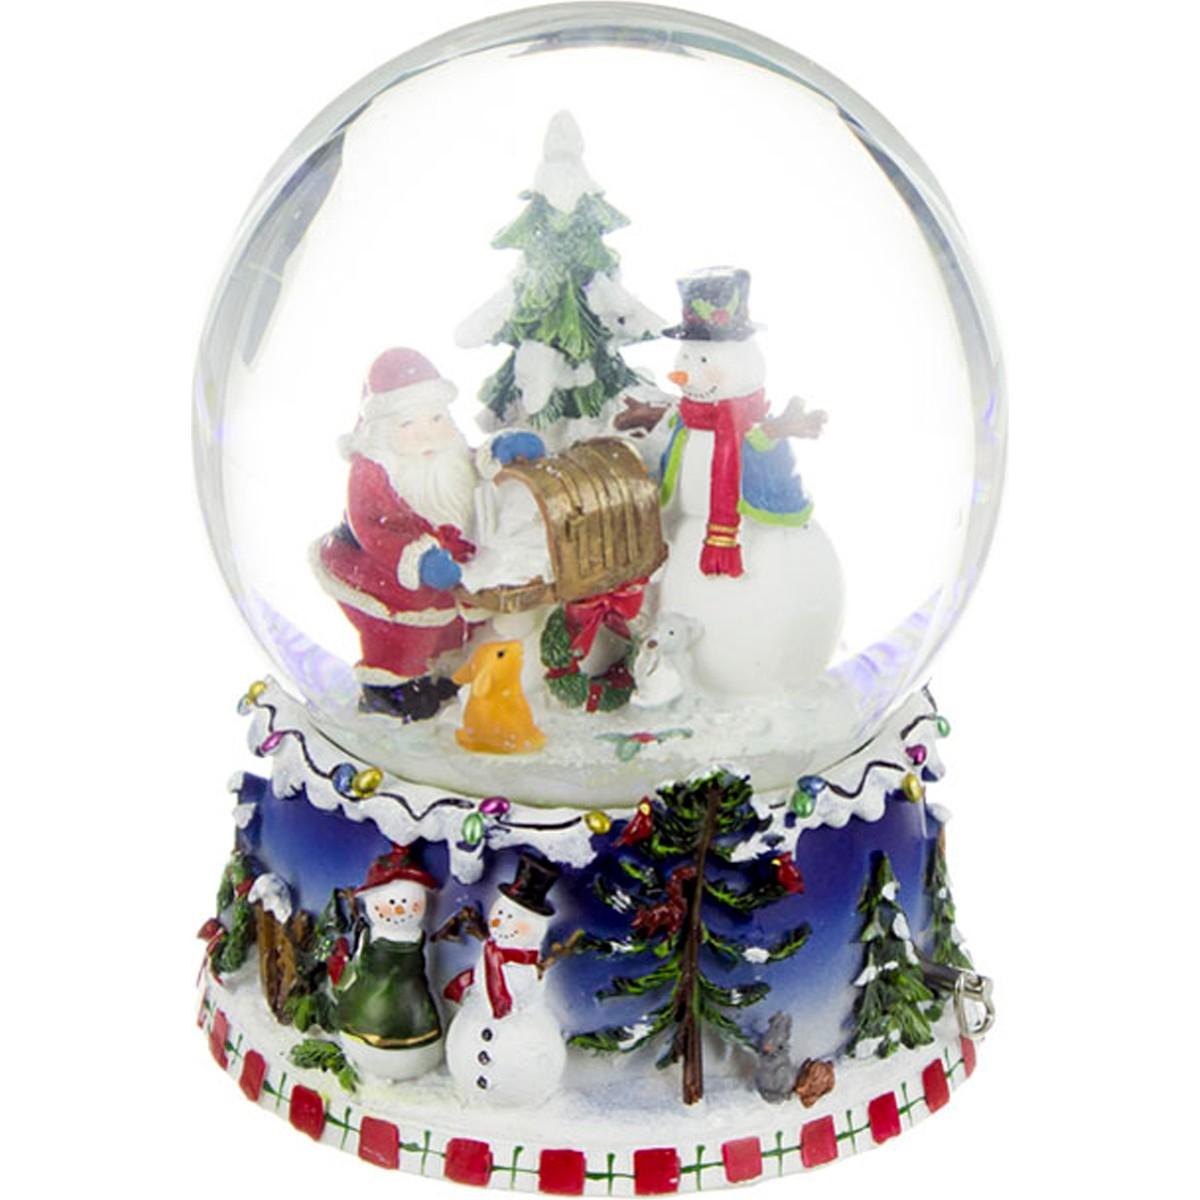 Фото в подарок на елочном шаре